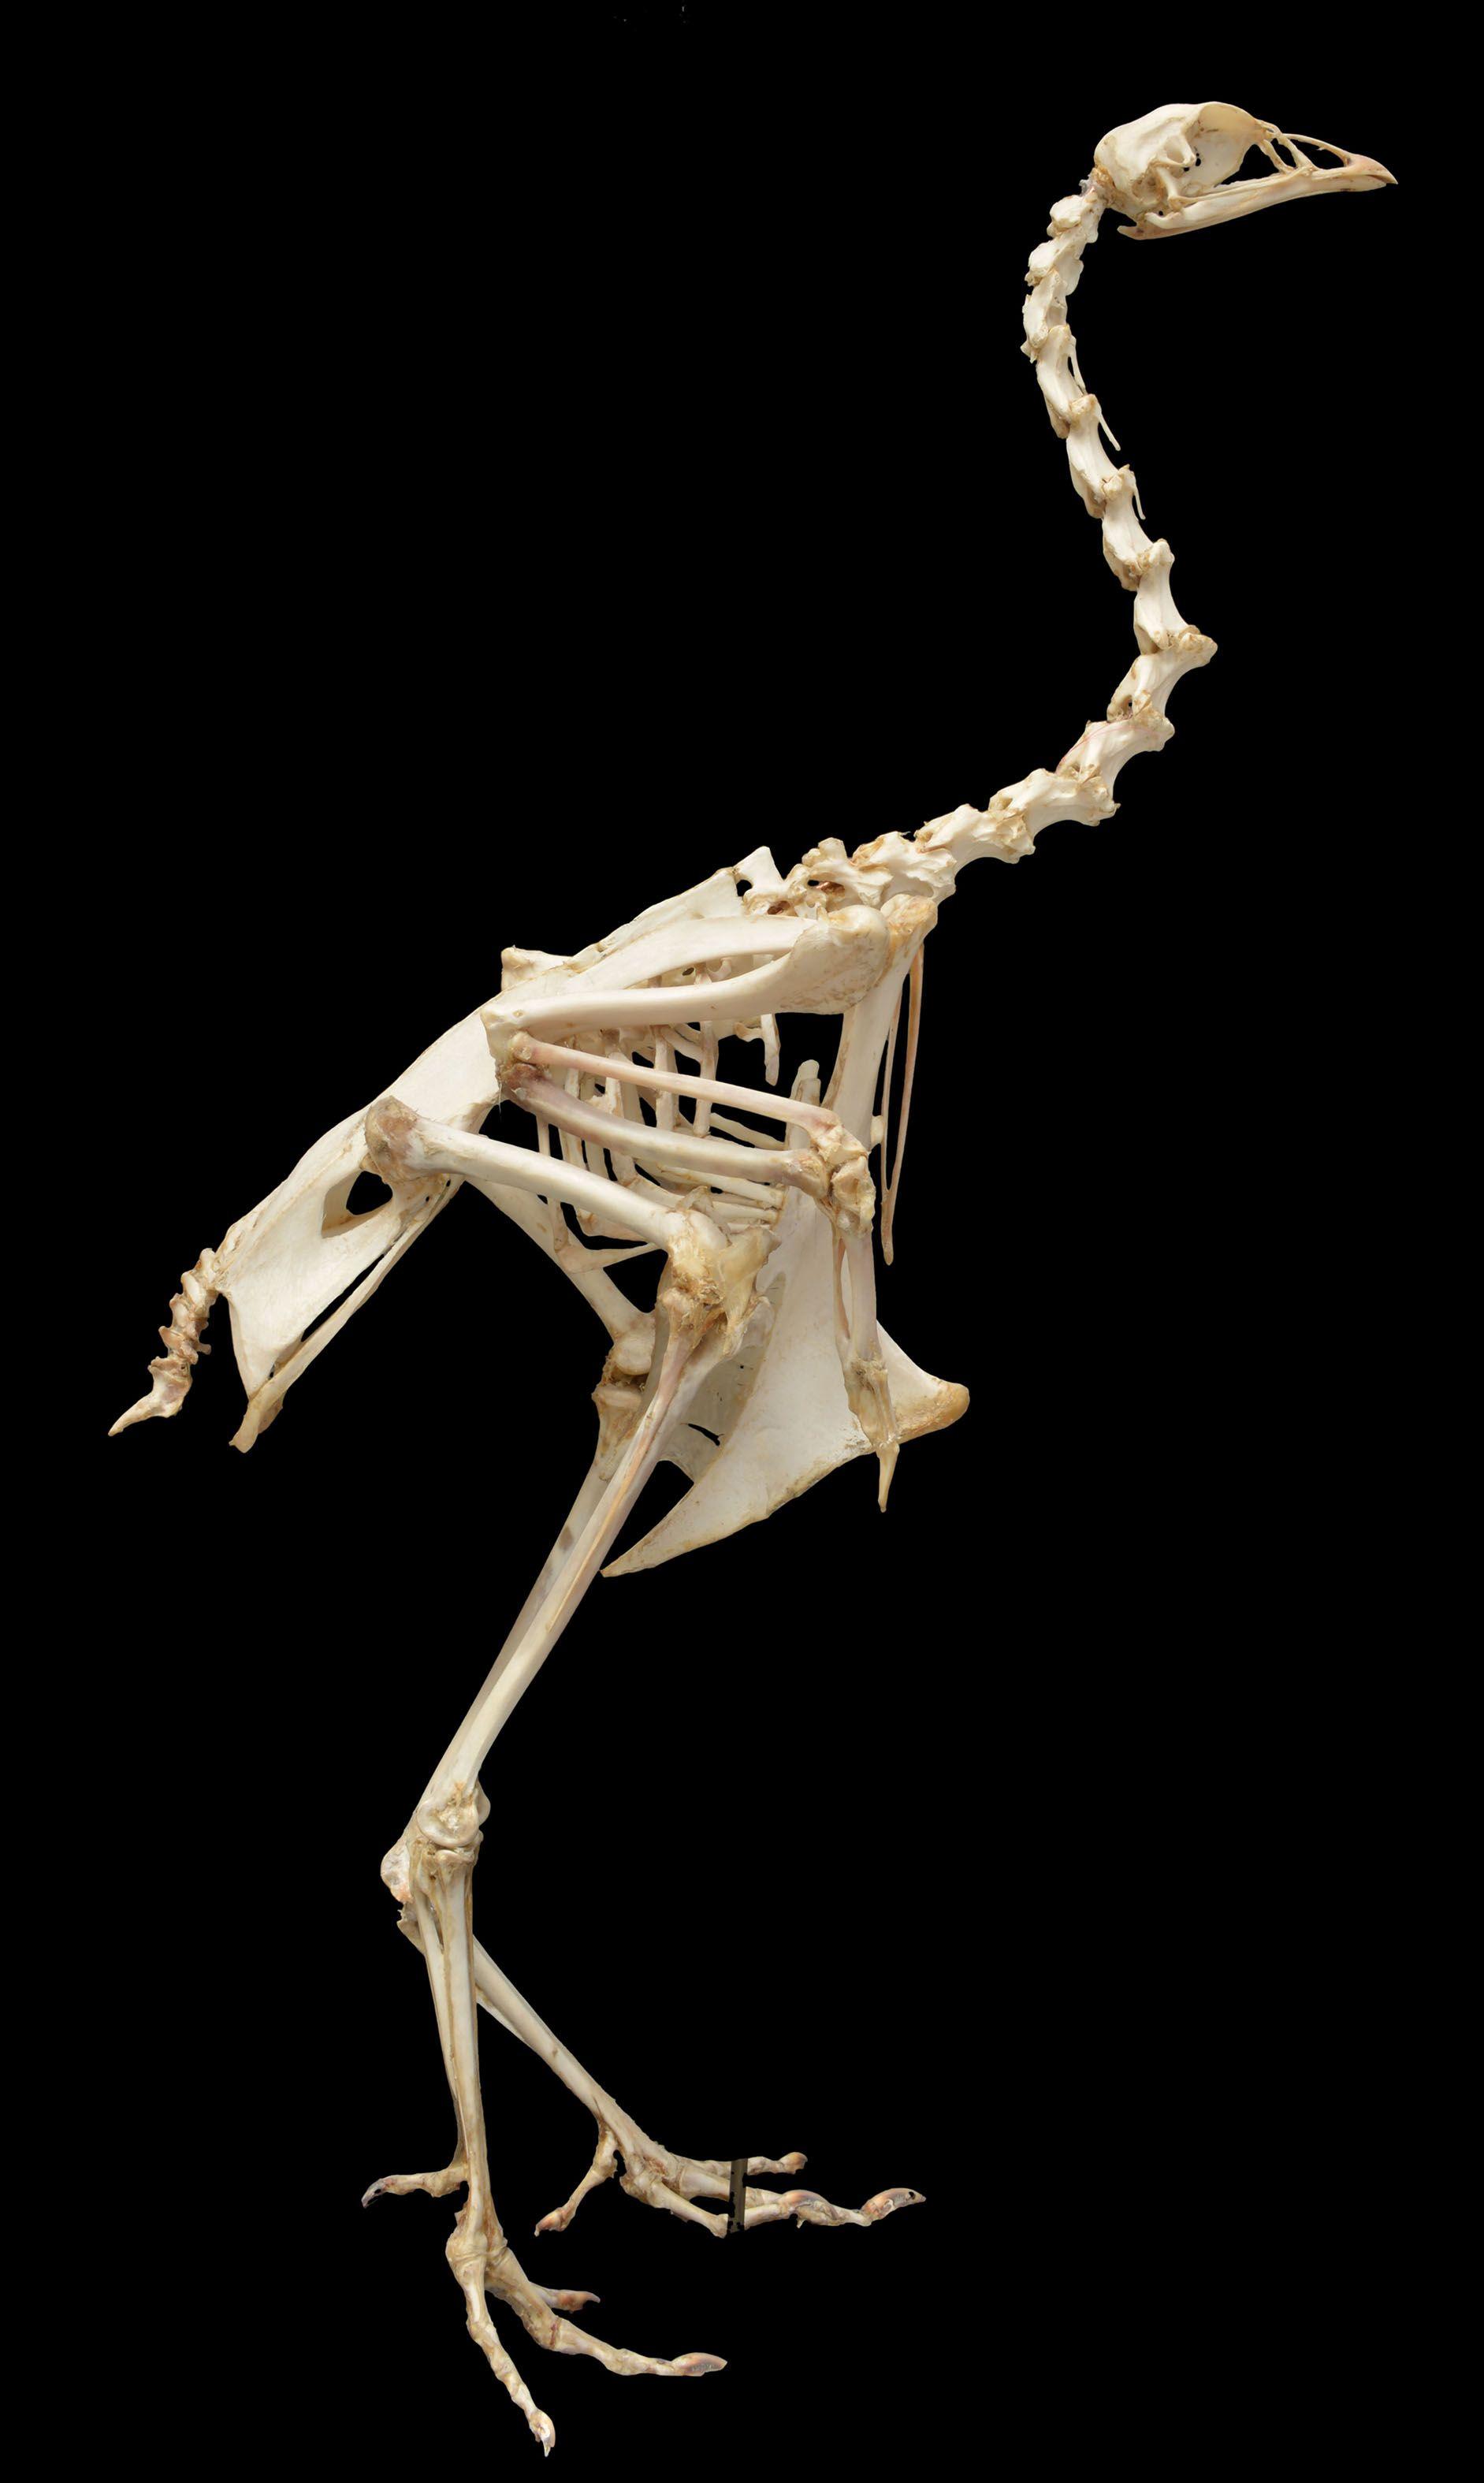 dindon_domestique_MHNN.Z.019641_3.jpg 1,883×3,150 pixels | Anatomy ...